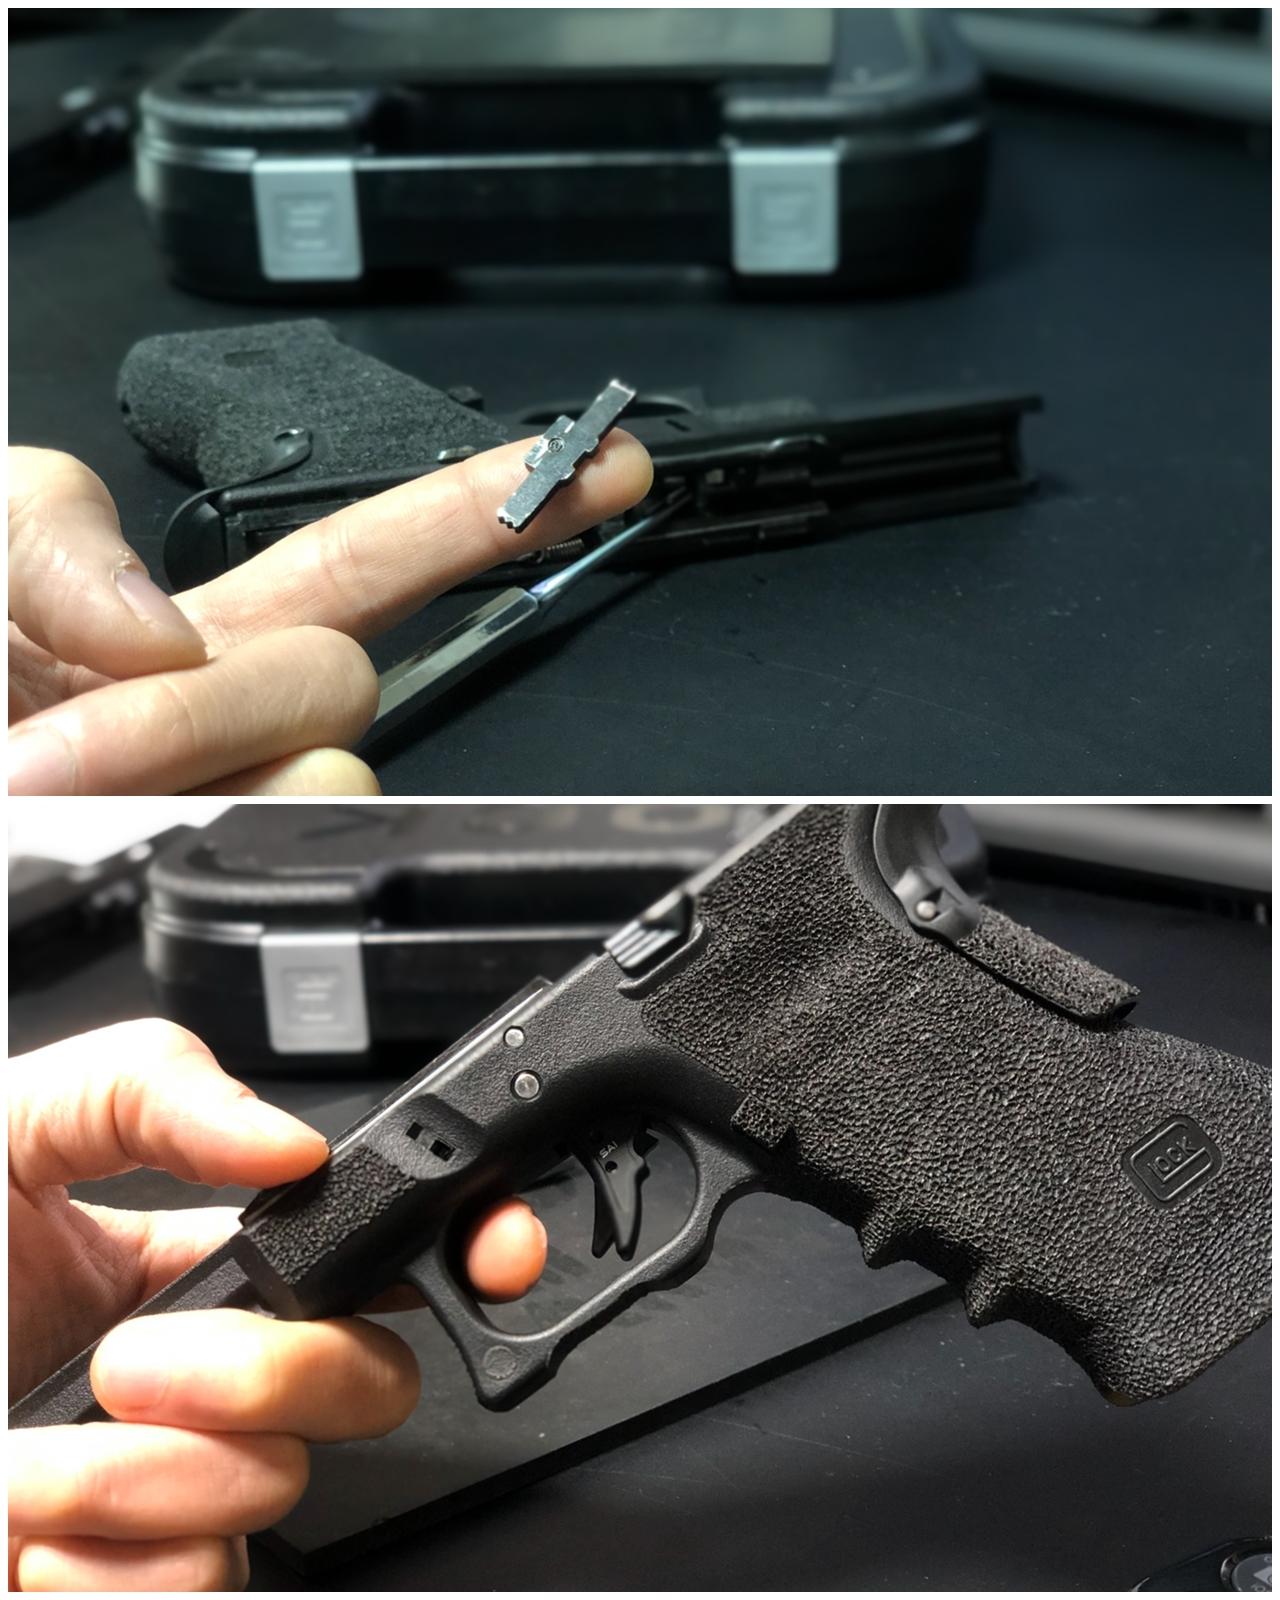 3 GLOCK G18C カスタムしたるぞー!!続編!! Guns Modify ステンレス フレーム ロックピン & エクステンドスライドロック!! 購入 取付 交換 カスタム レビュー!!